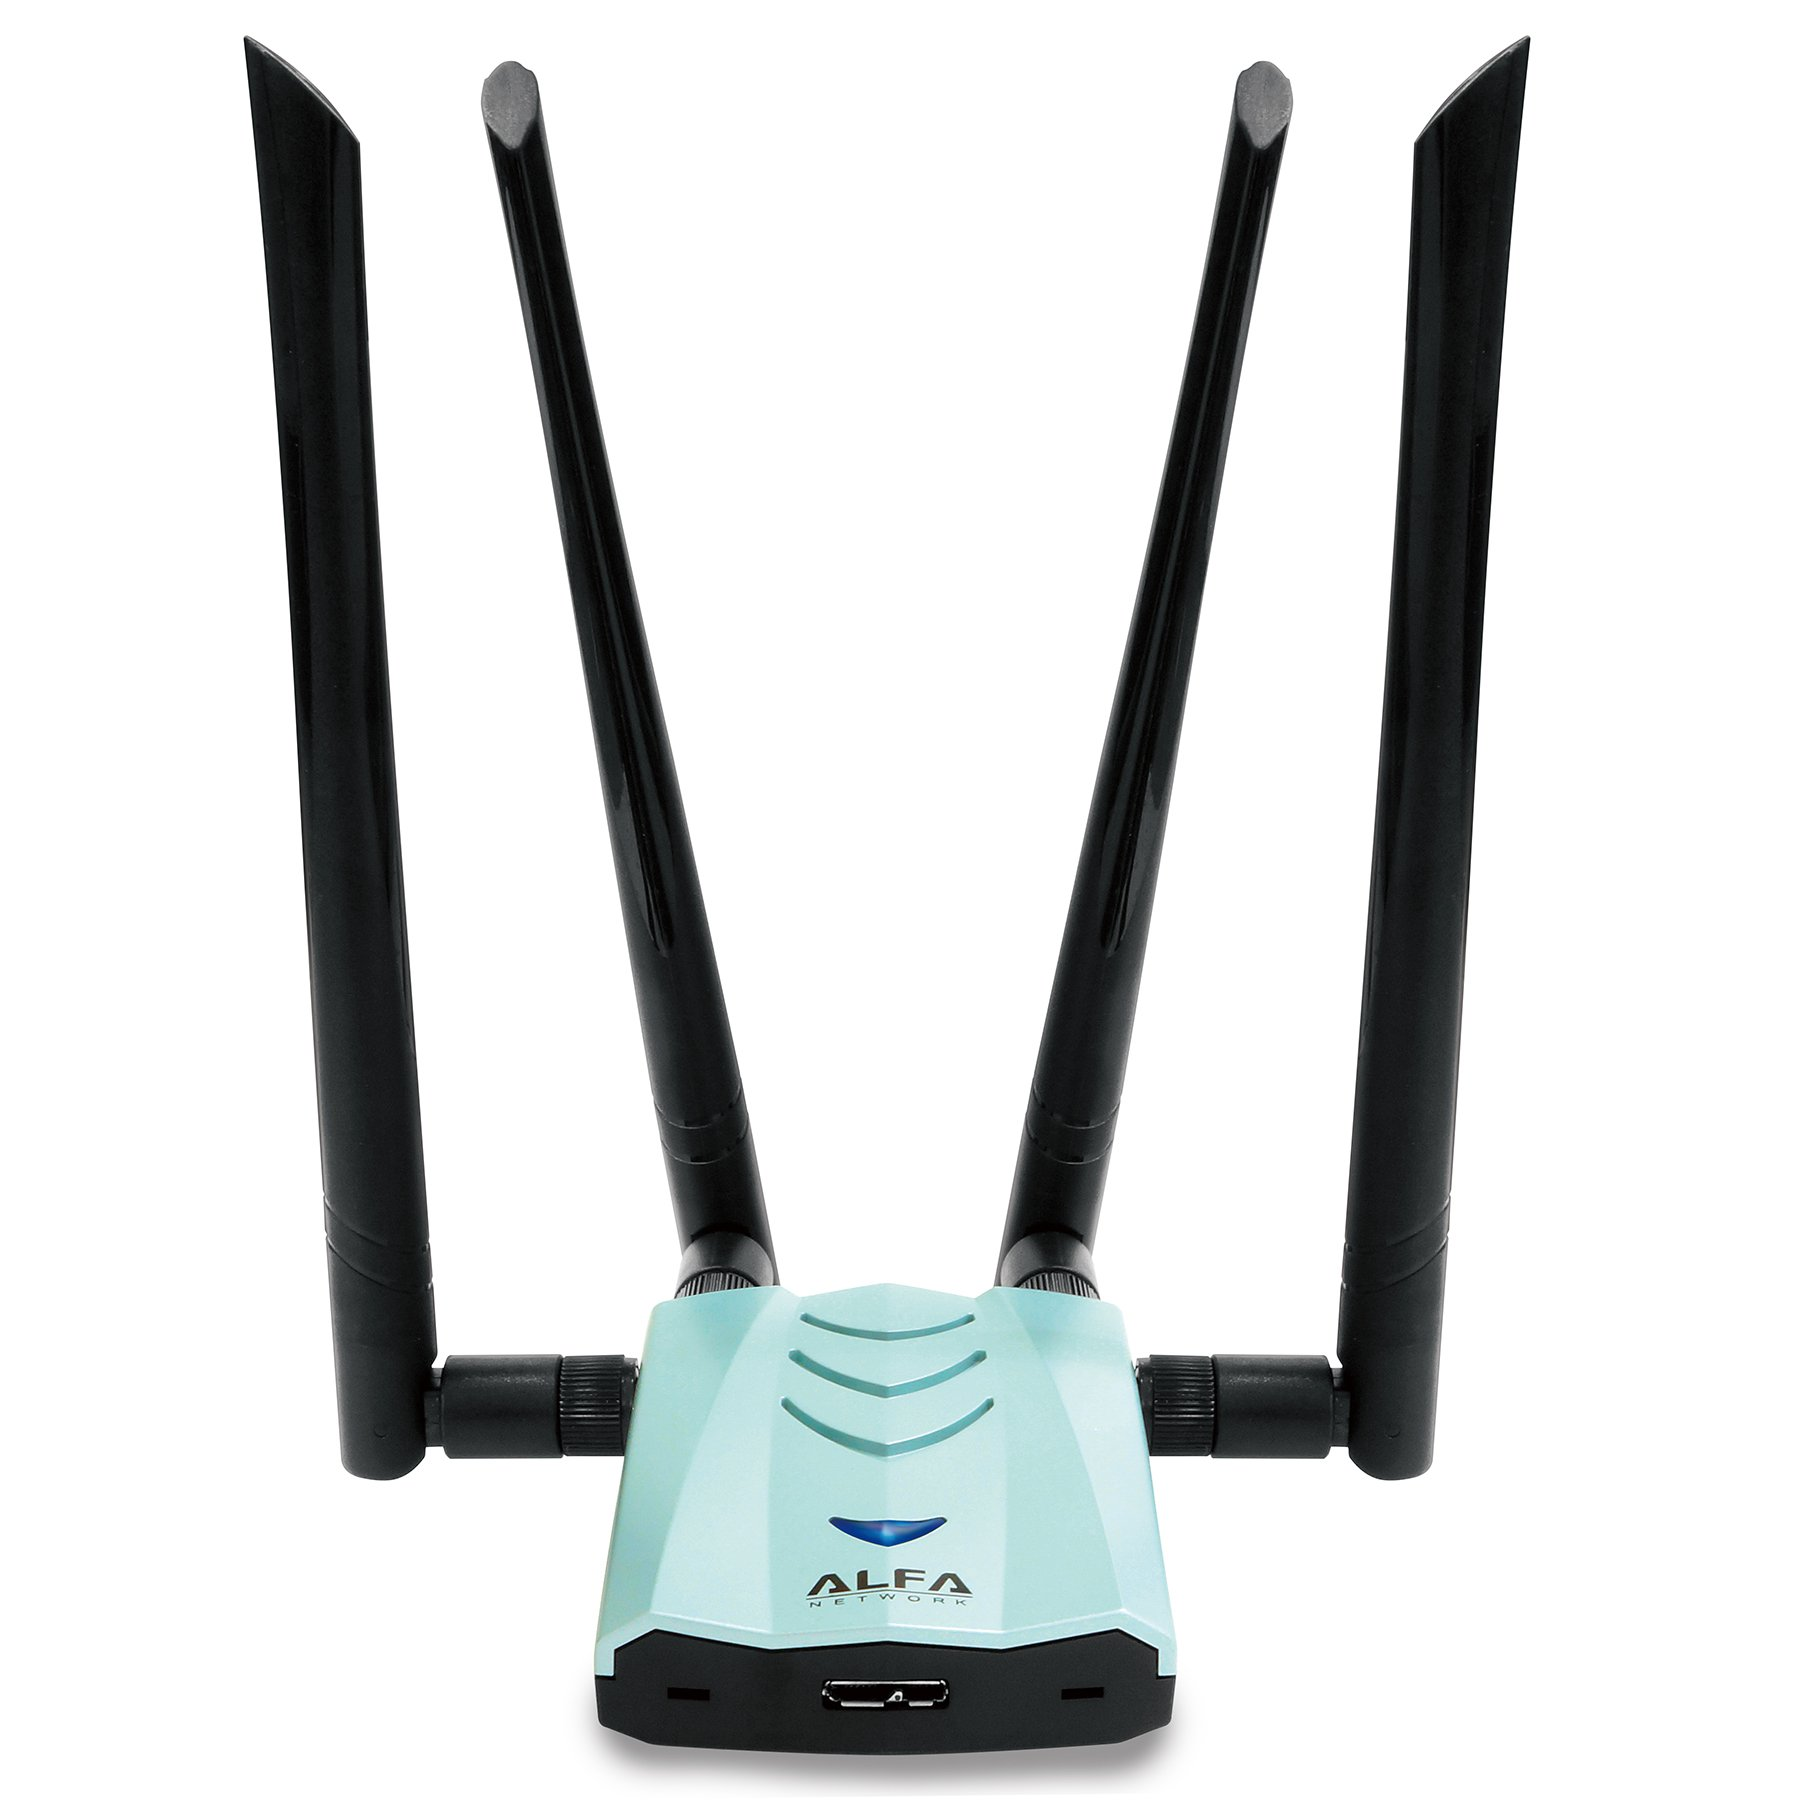 Alfa AC1900 WiFi Adapter - 1900 Mbps 802.11ac Long-Range Dual Band USB 3.0 Wi-Fi Network Adapter w/4x 5dBi External Dual-Band Antennas by Alfa